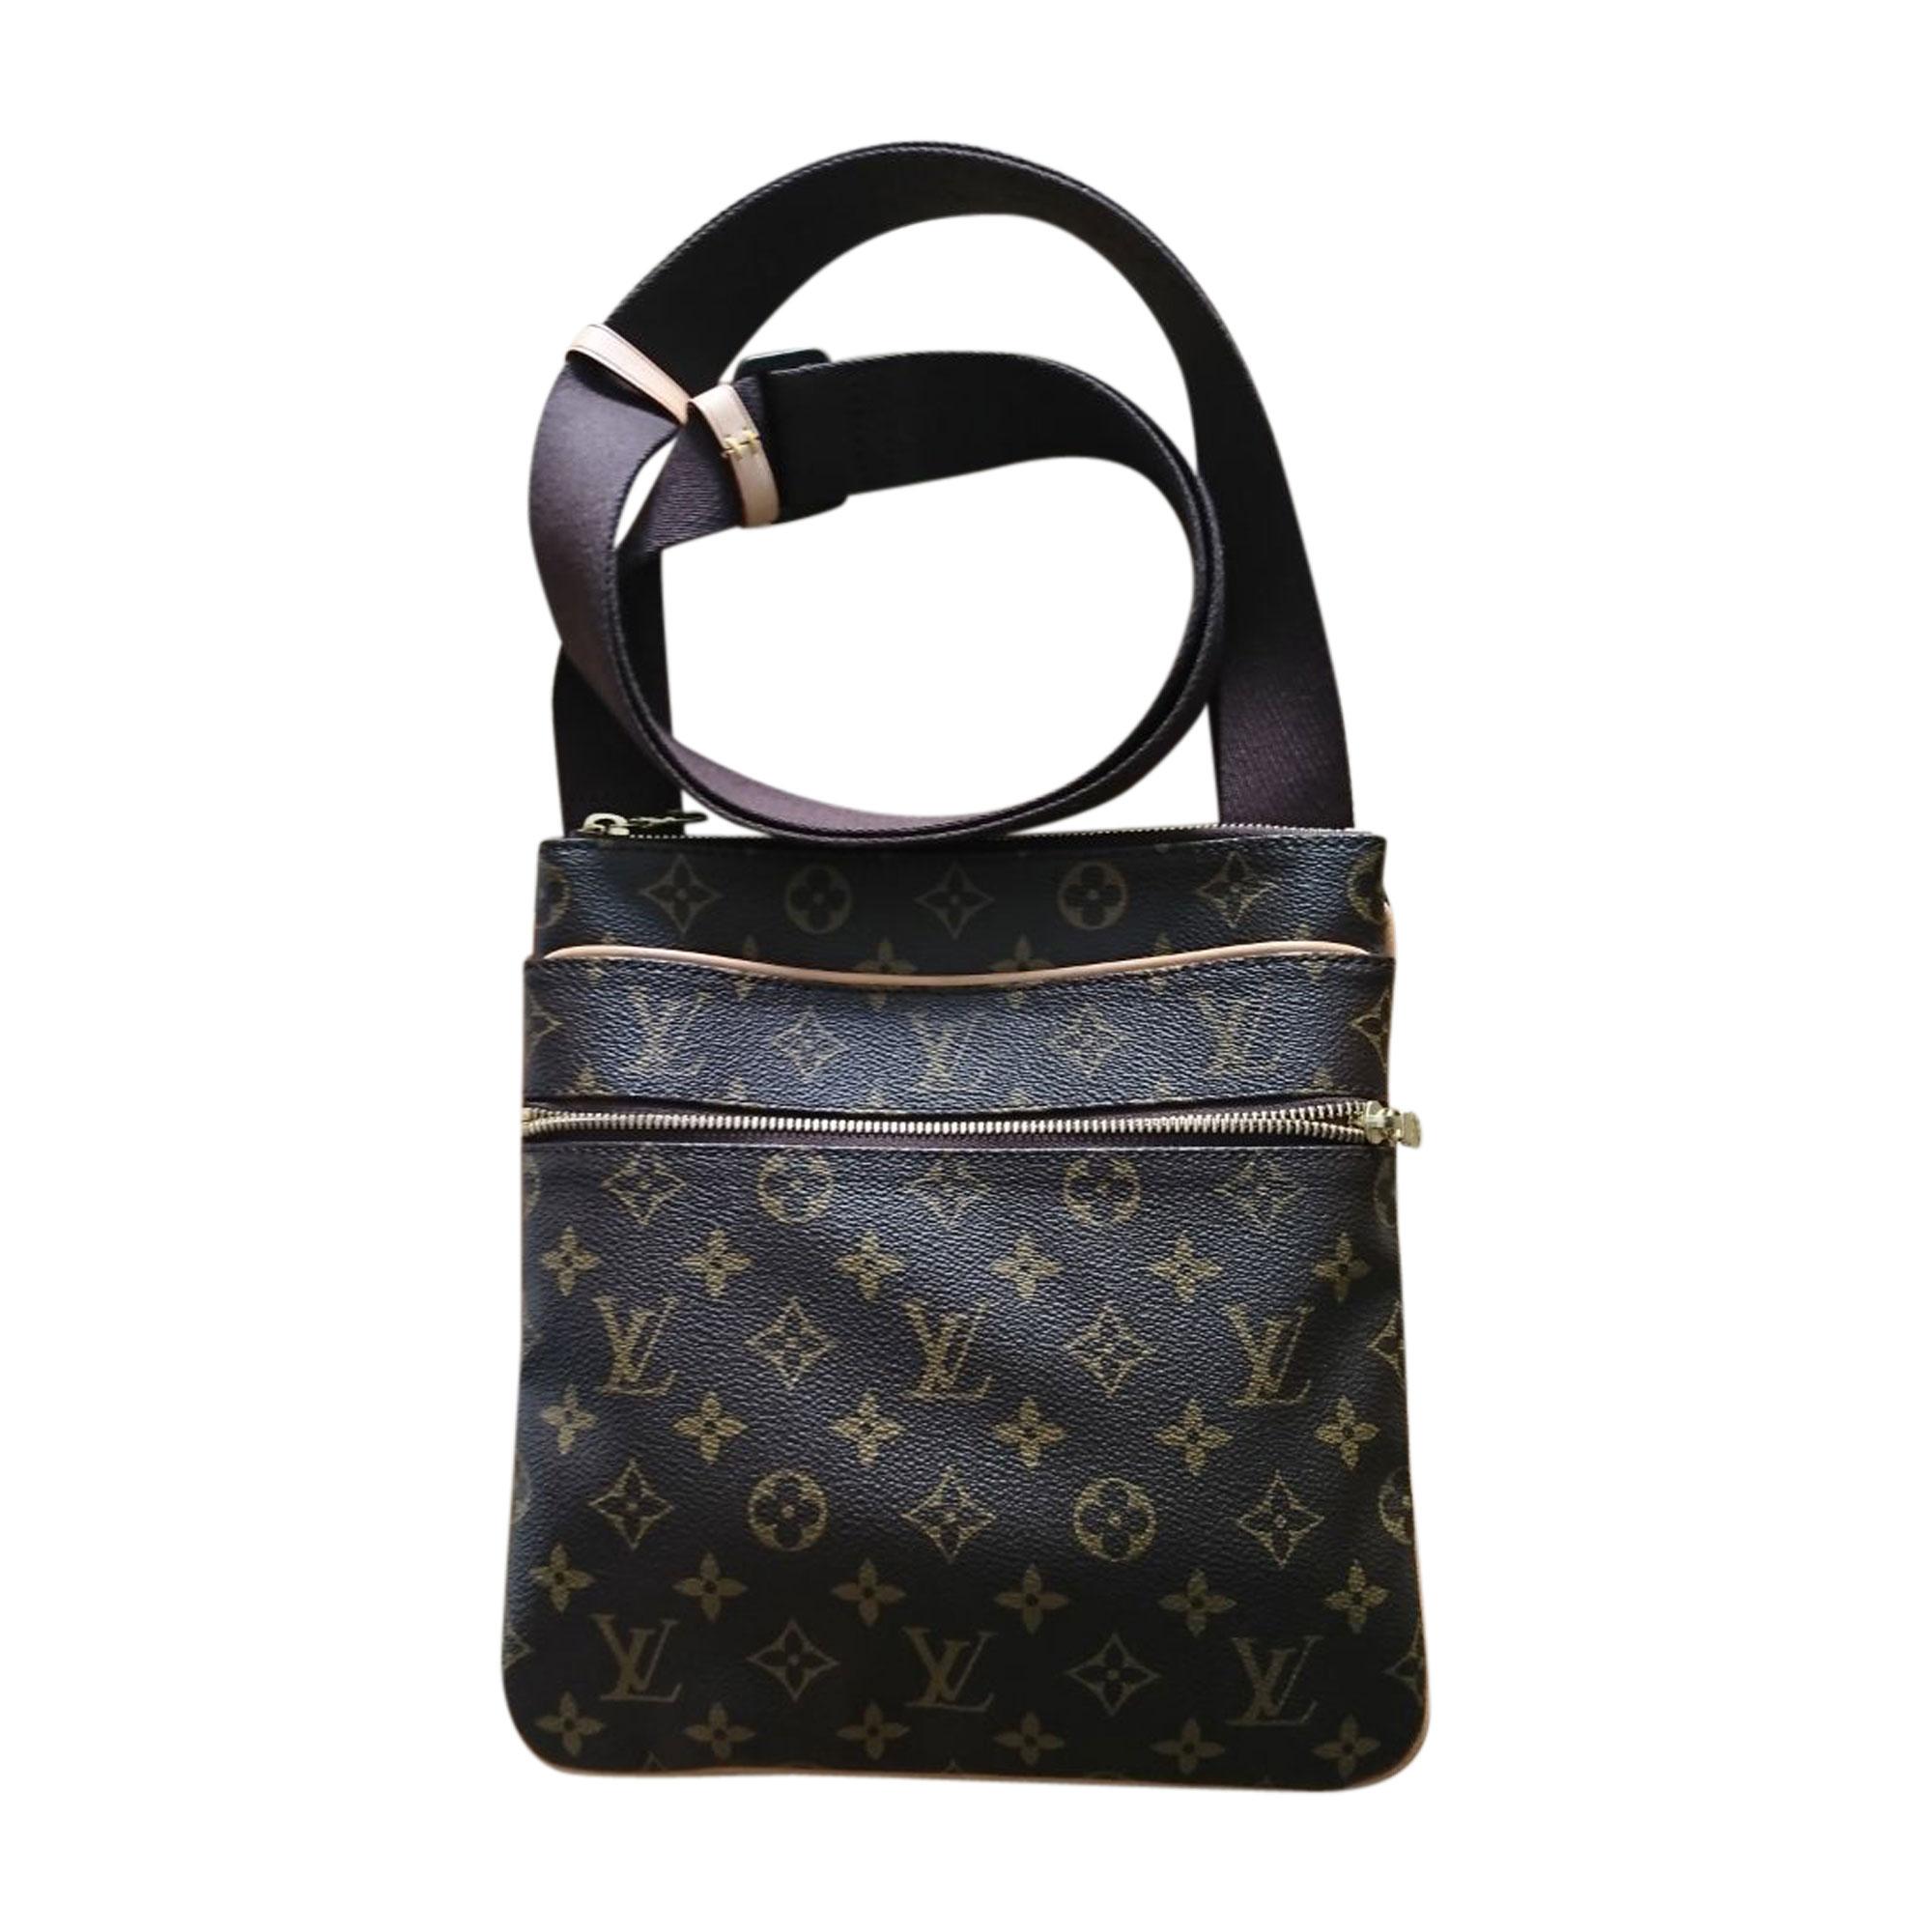 3c286300c6f Louis Vuitton Sacoche